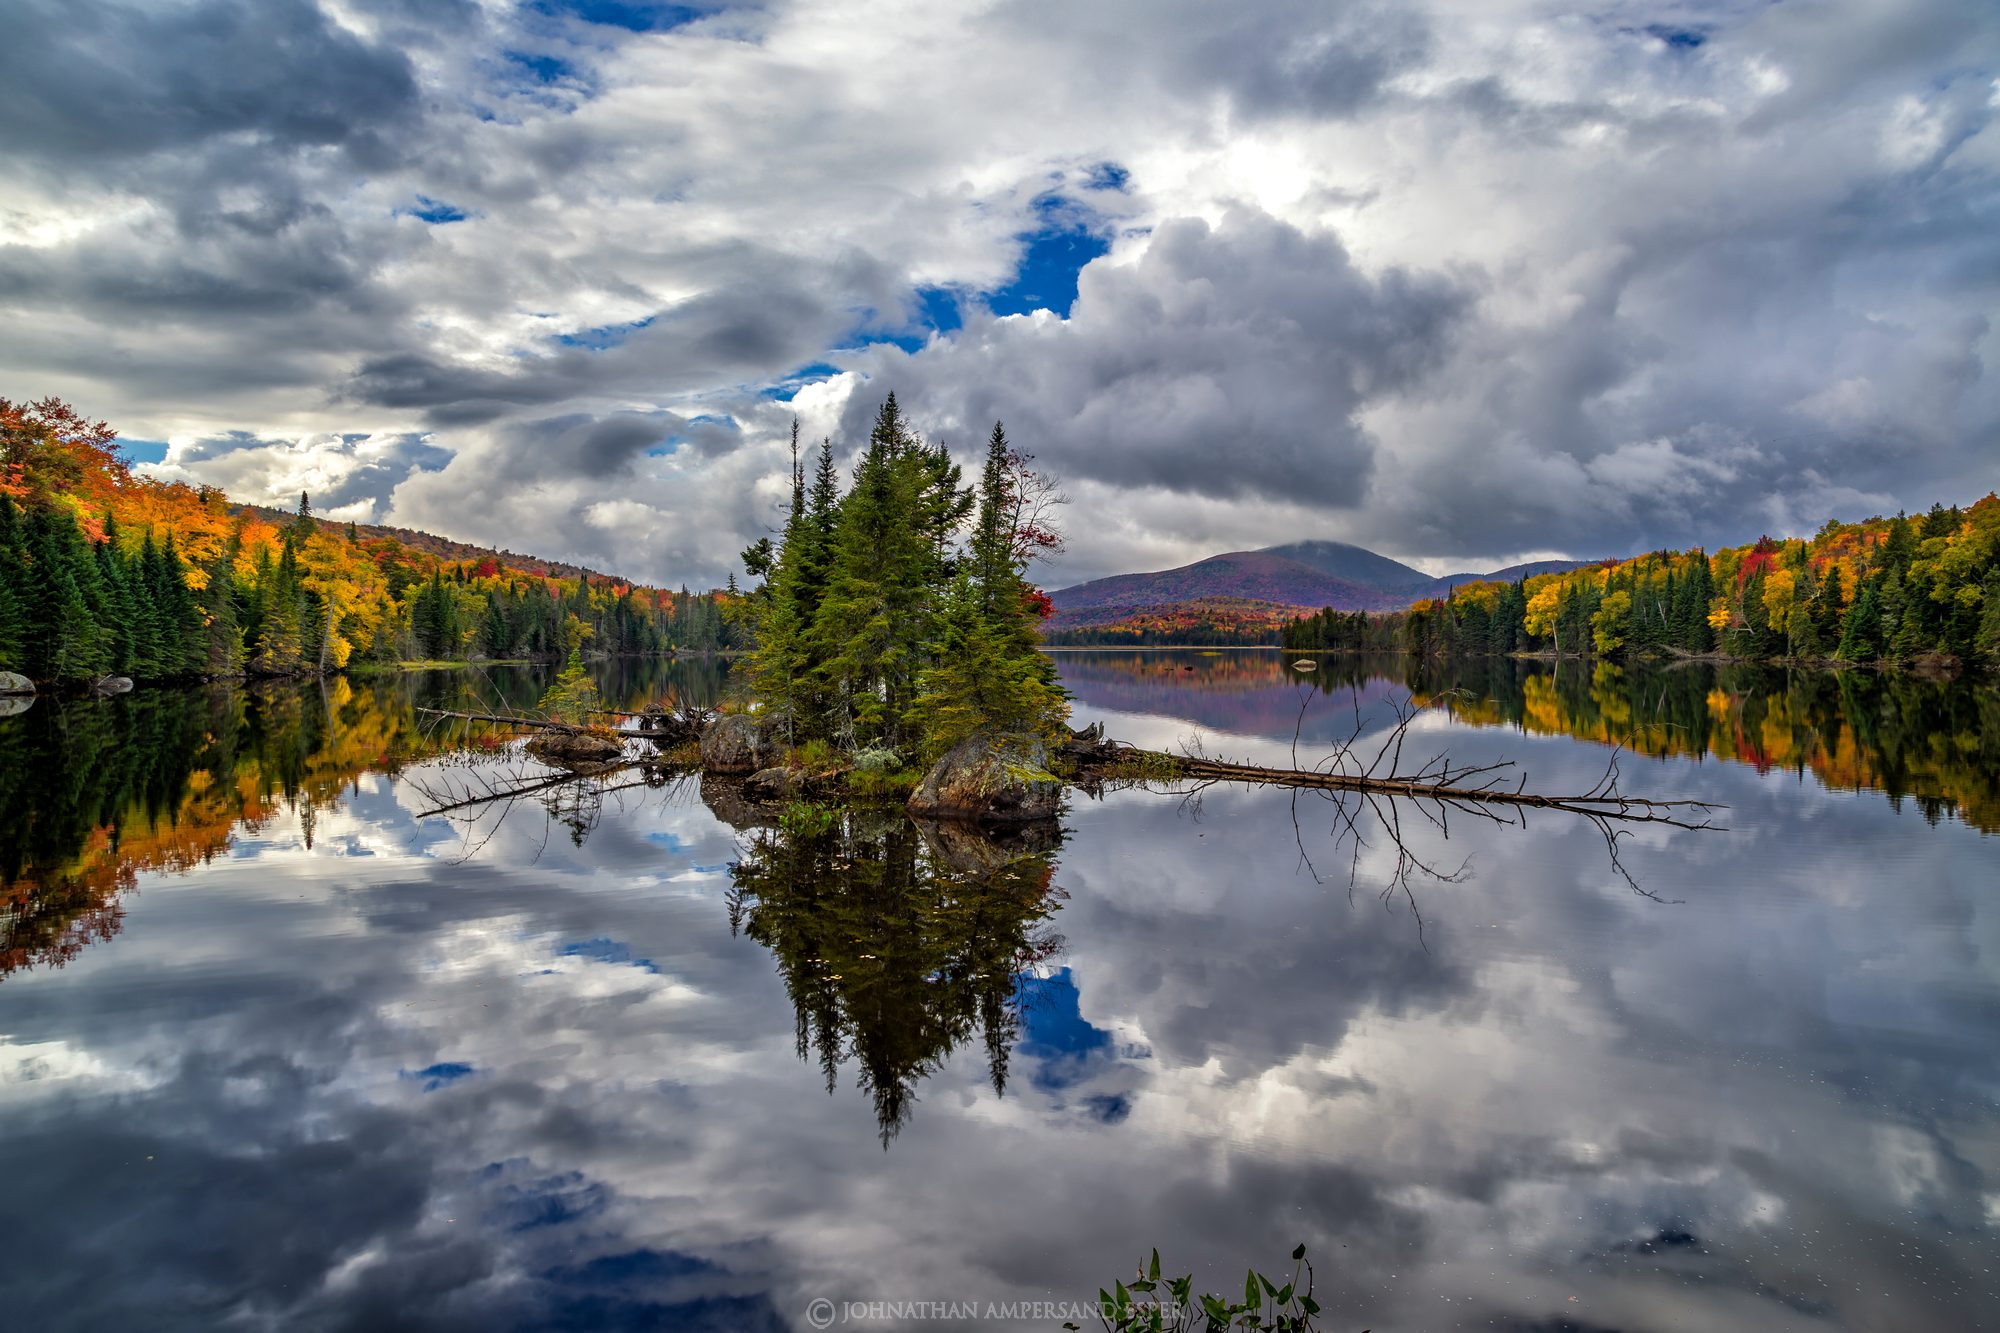 County Line Flow,Kempshall Mt,island,reflection,fall,2016,lake,Adirondacks,Adirondack lake,Adirondack photography,Adirondack...